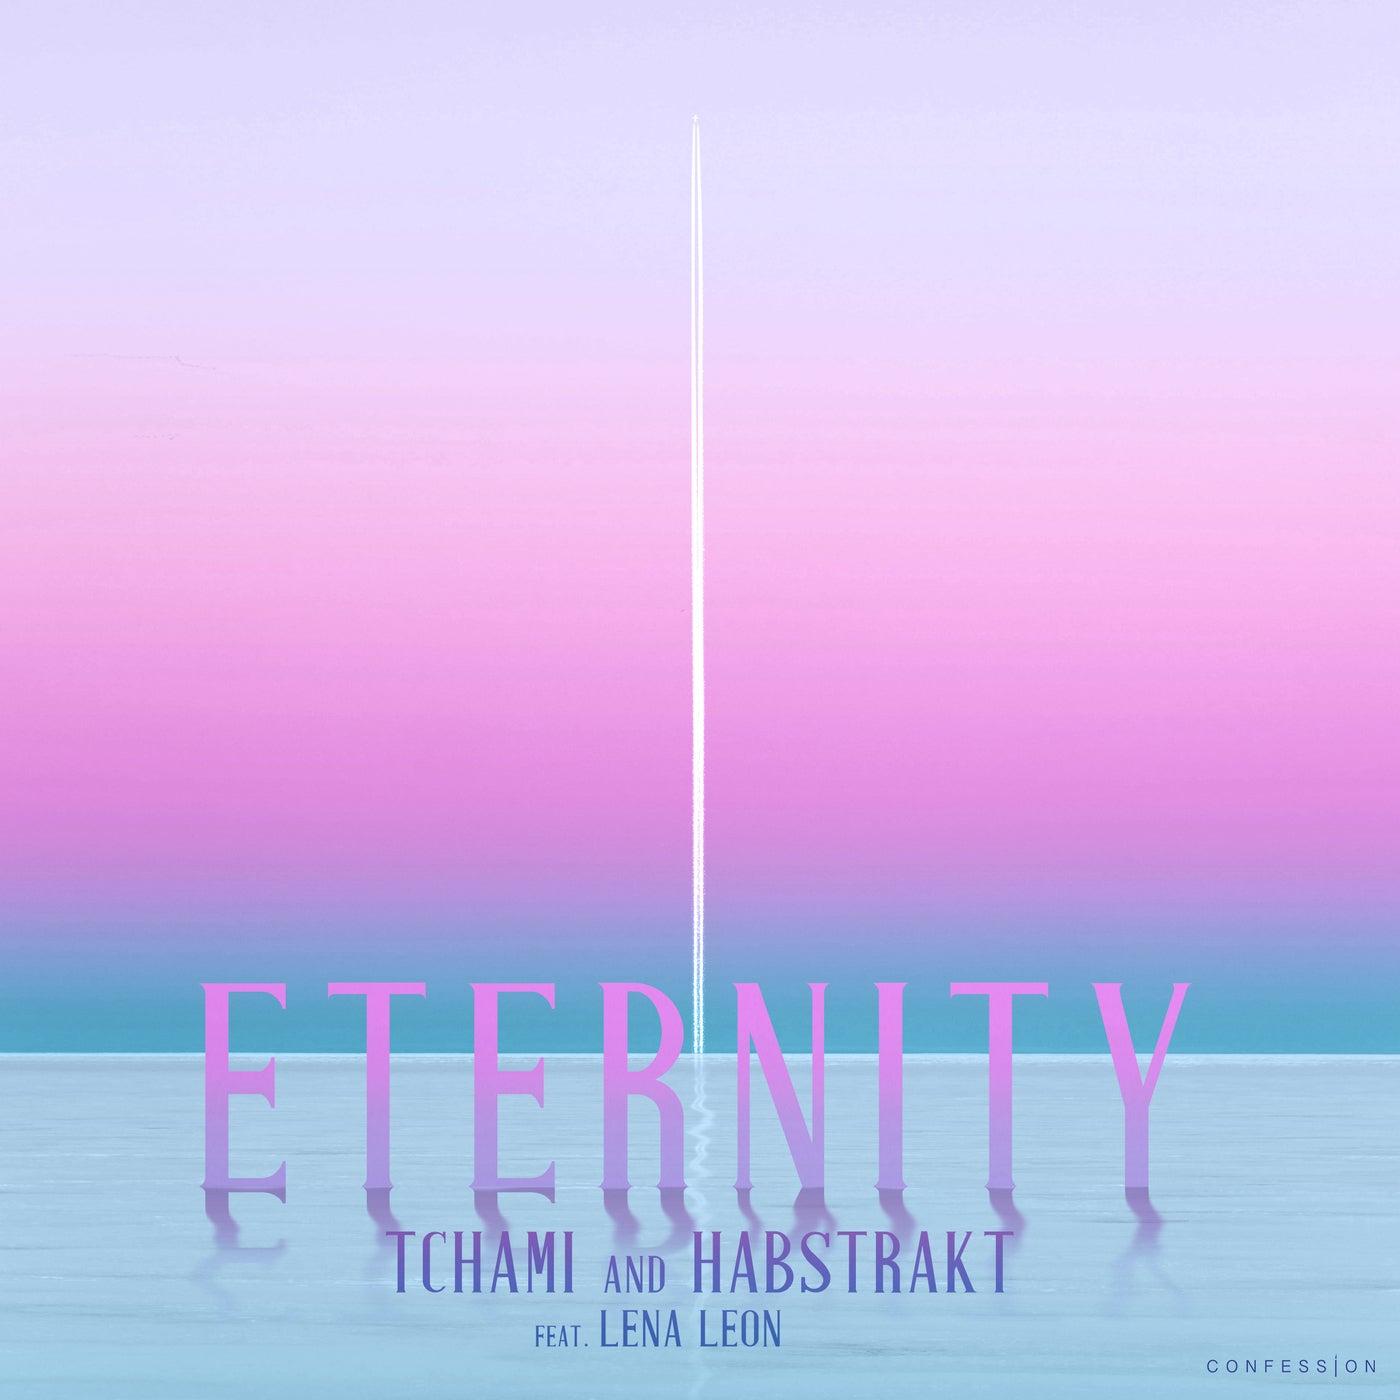 Eternity feat. Lena Leon (Original Mix)